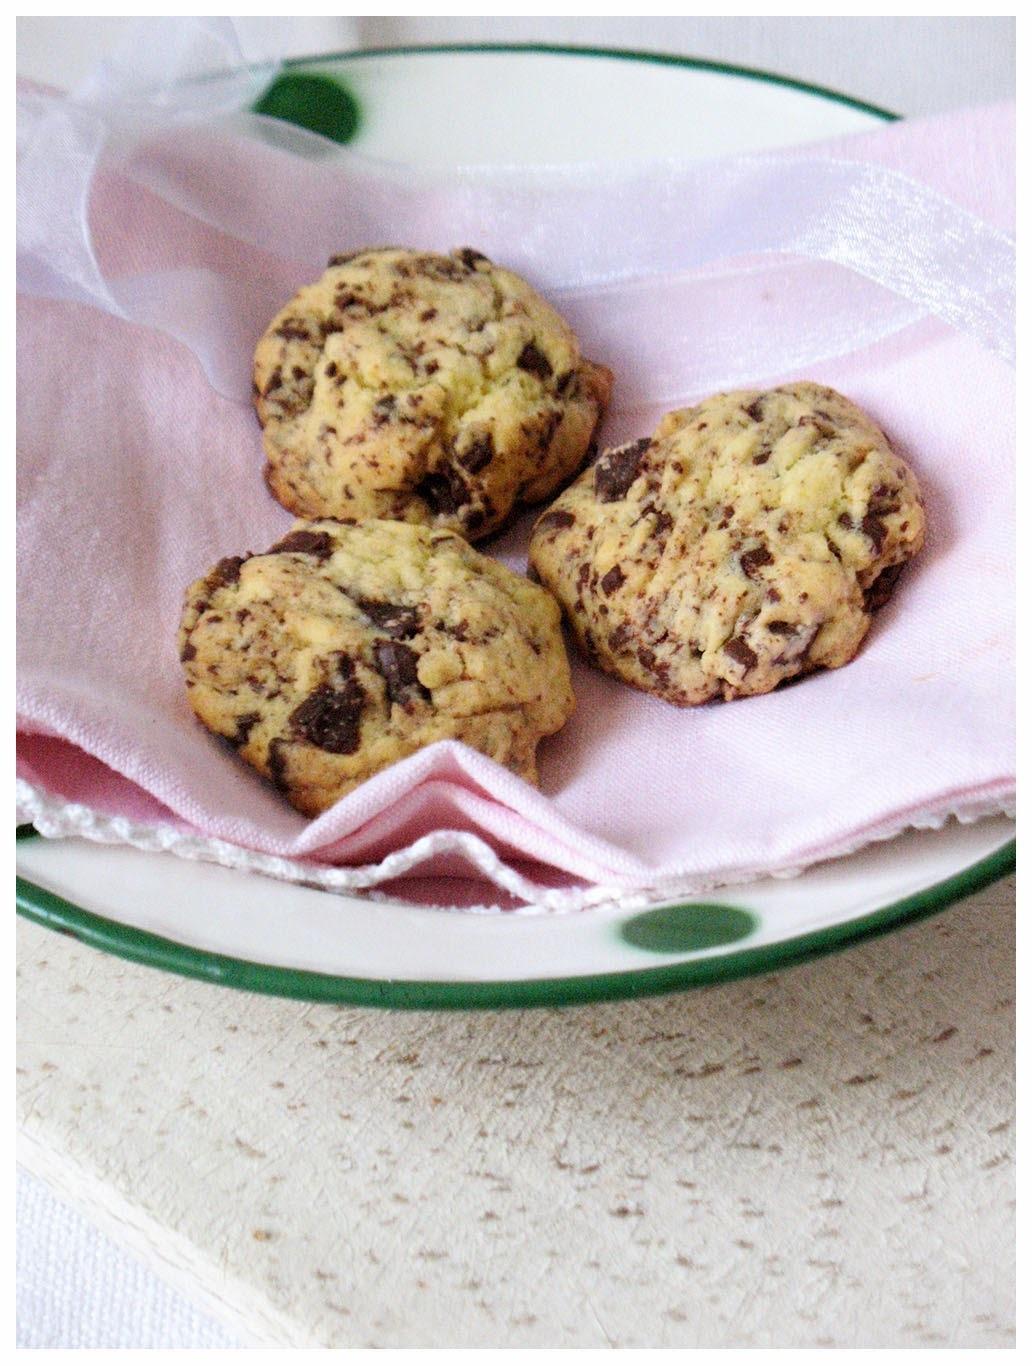 Najbolji keksi s komadićima čokolade/ The Best Chocolate Chip Cookies